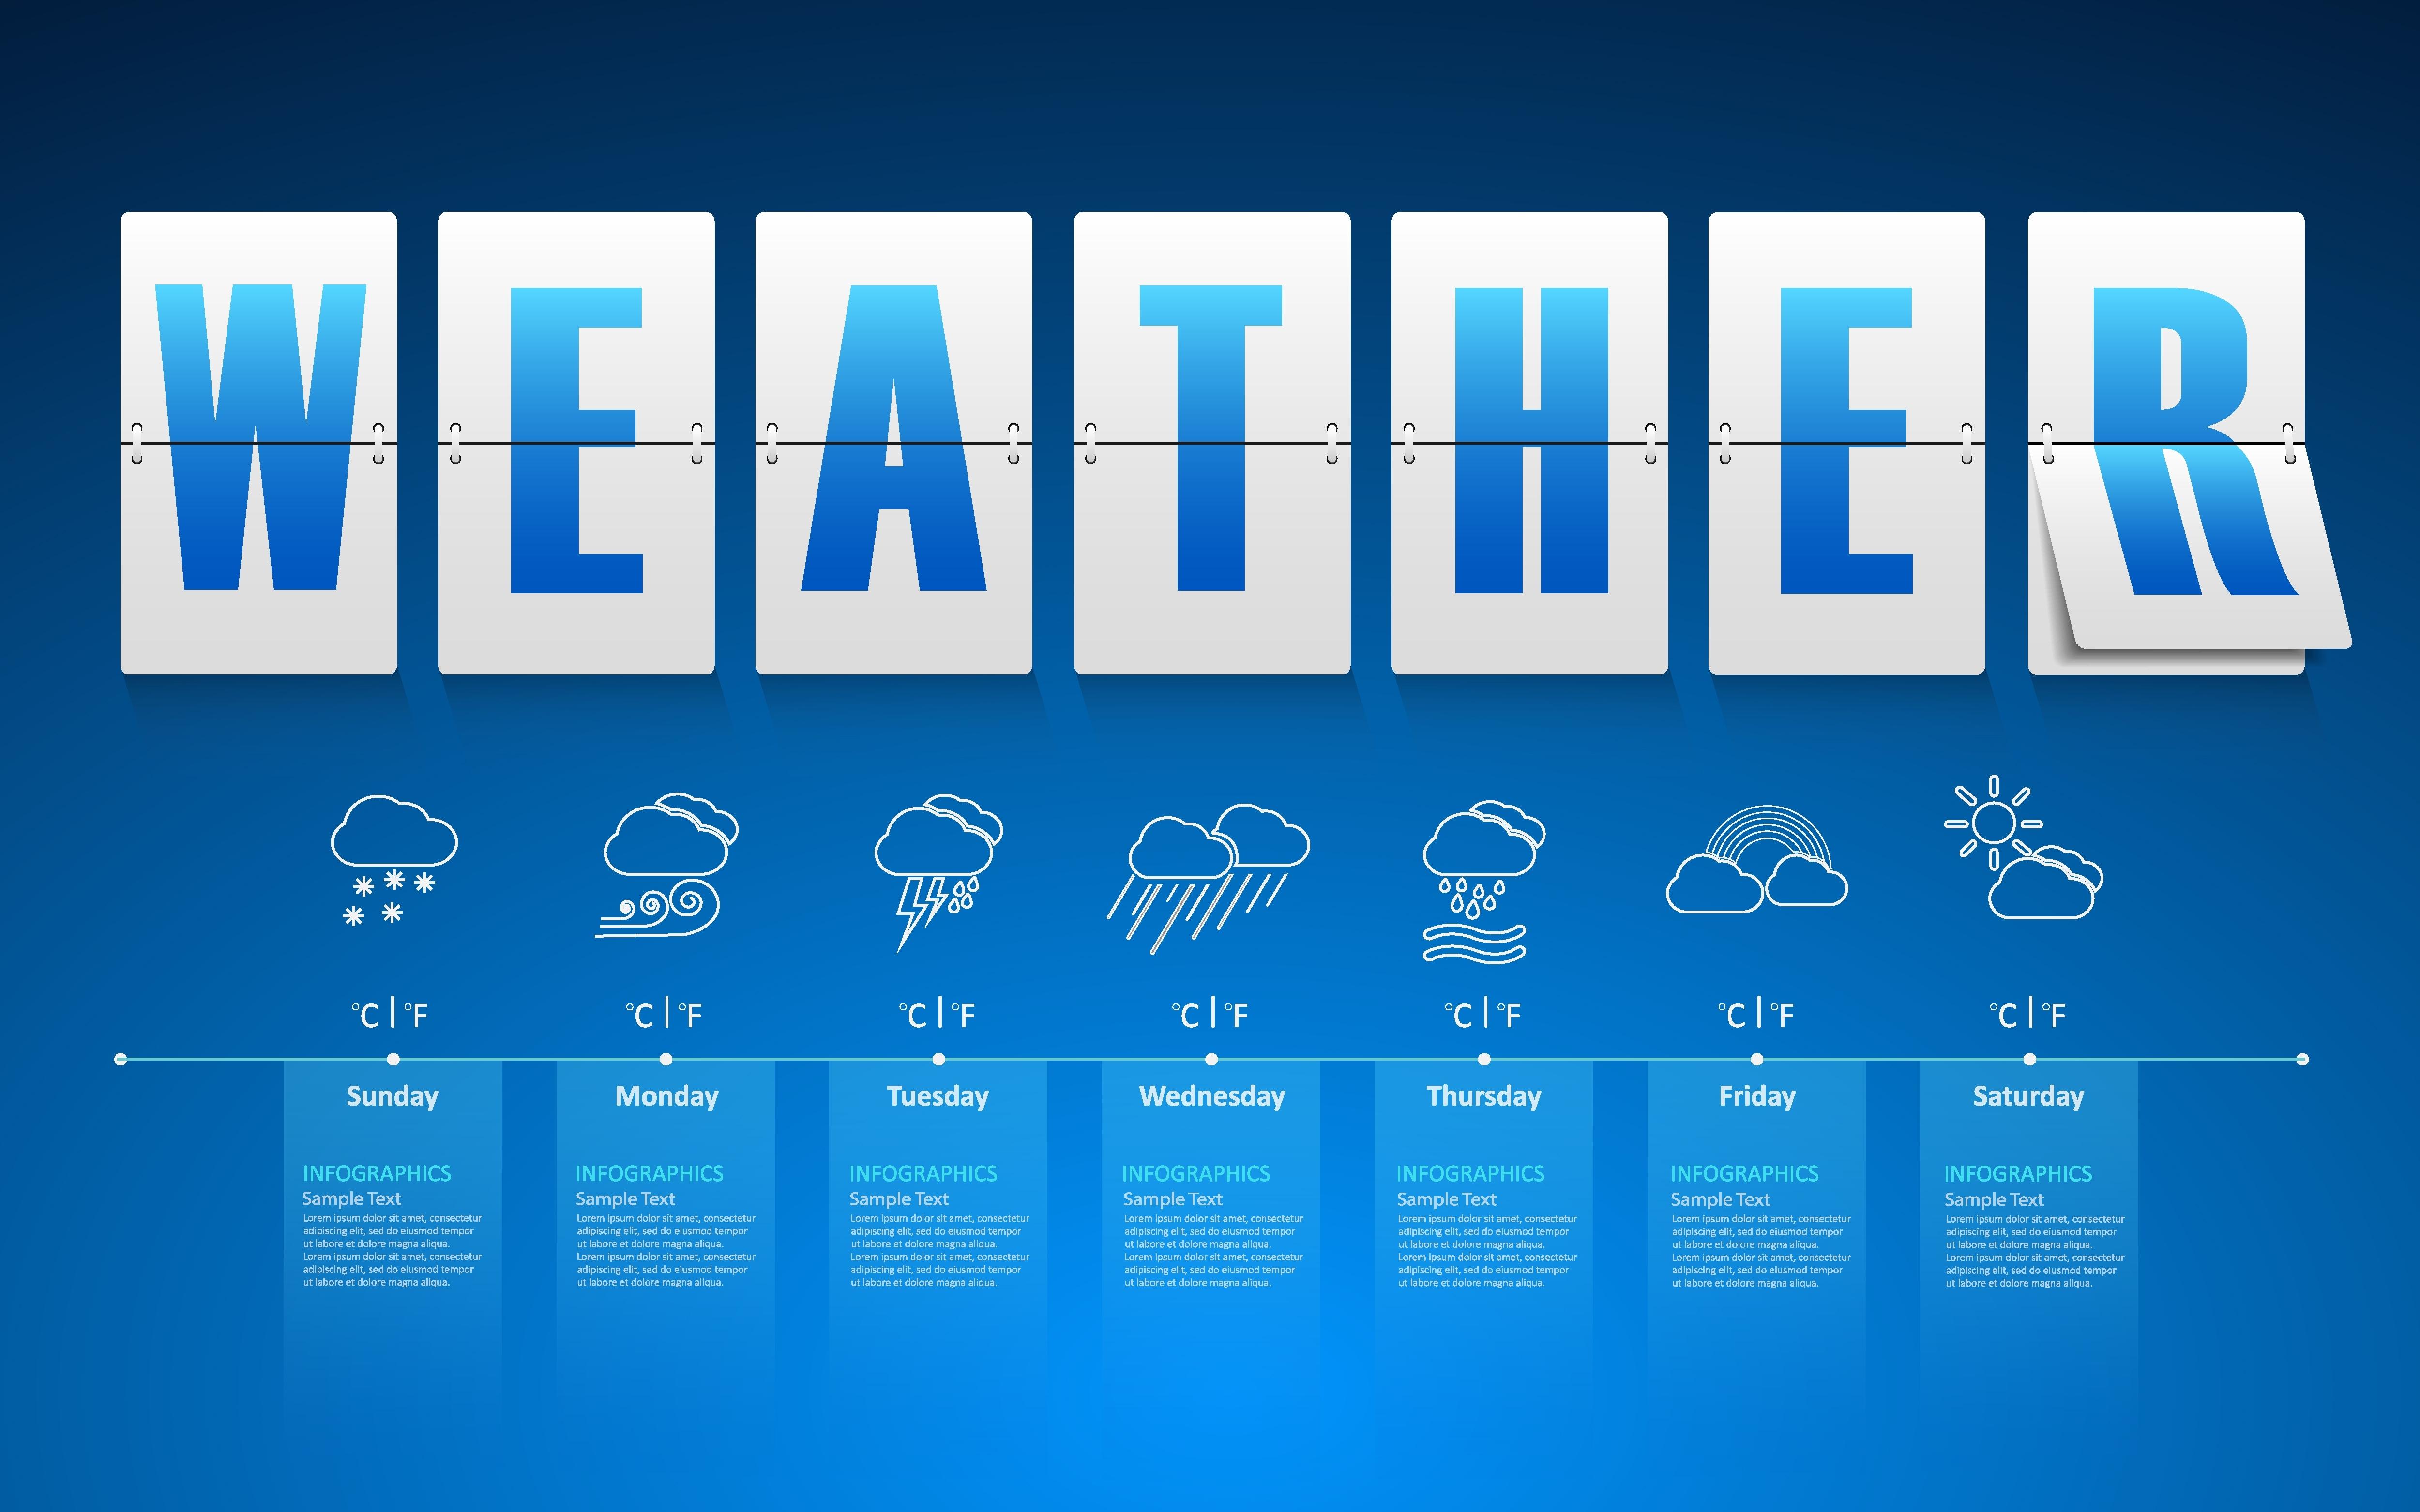 e2ff5287ef9ed1e5e22e_Weather.jpg